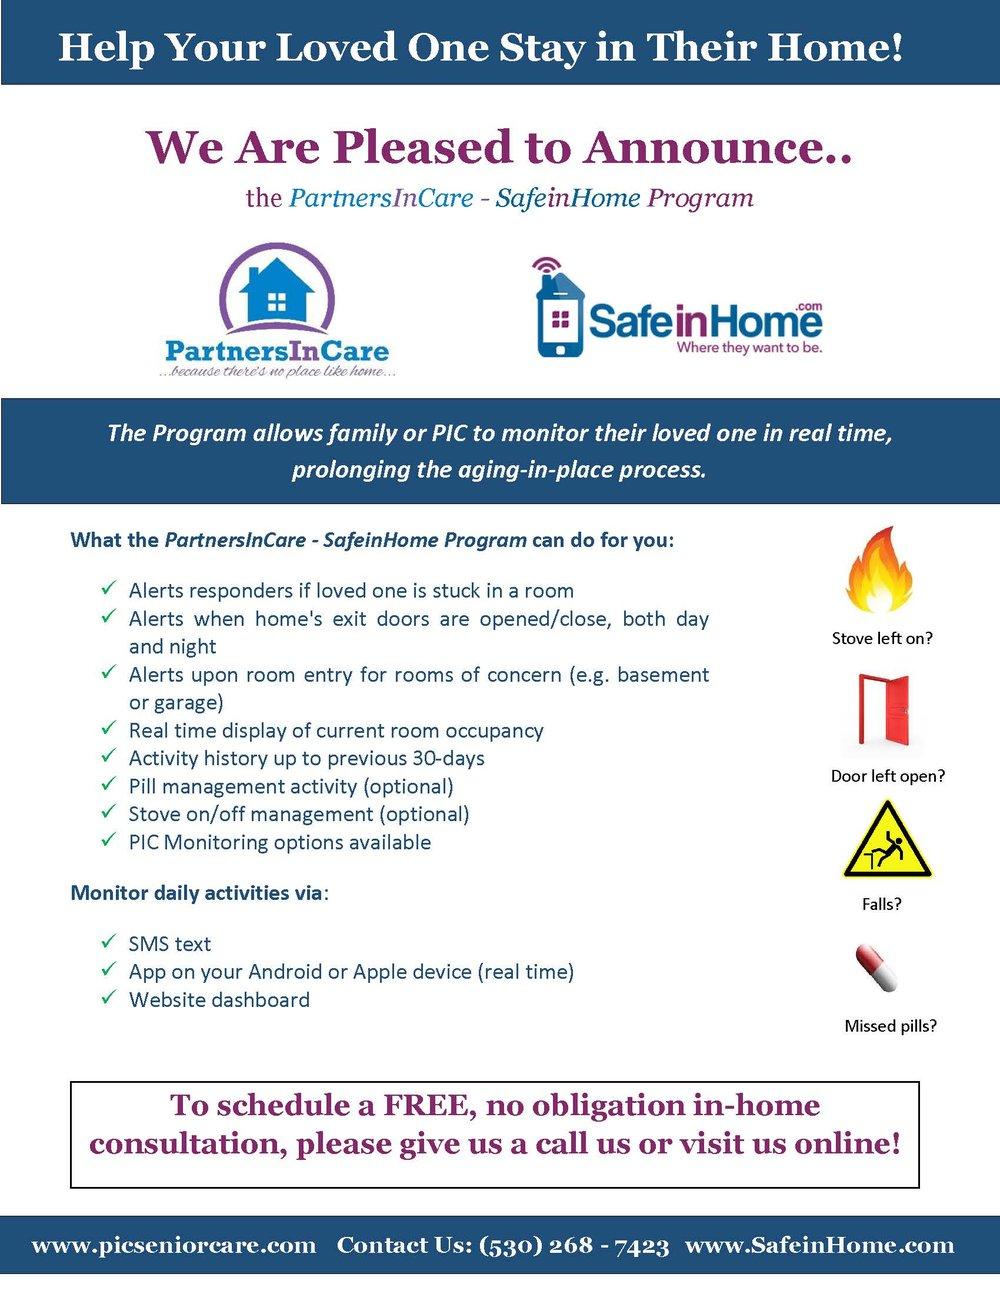 SafeInHome flyer